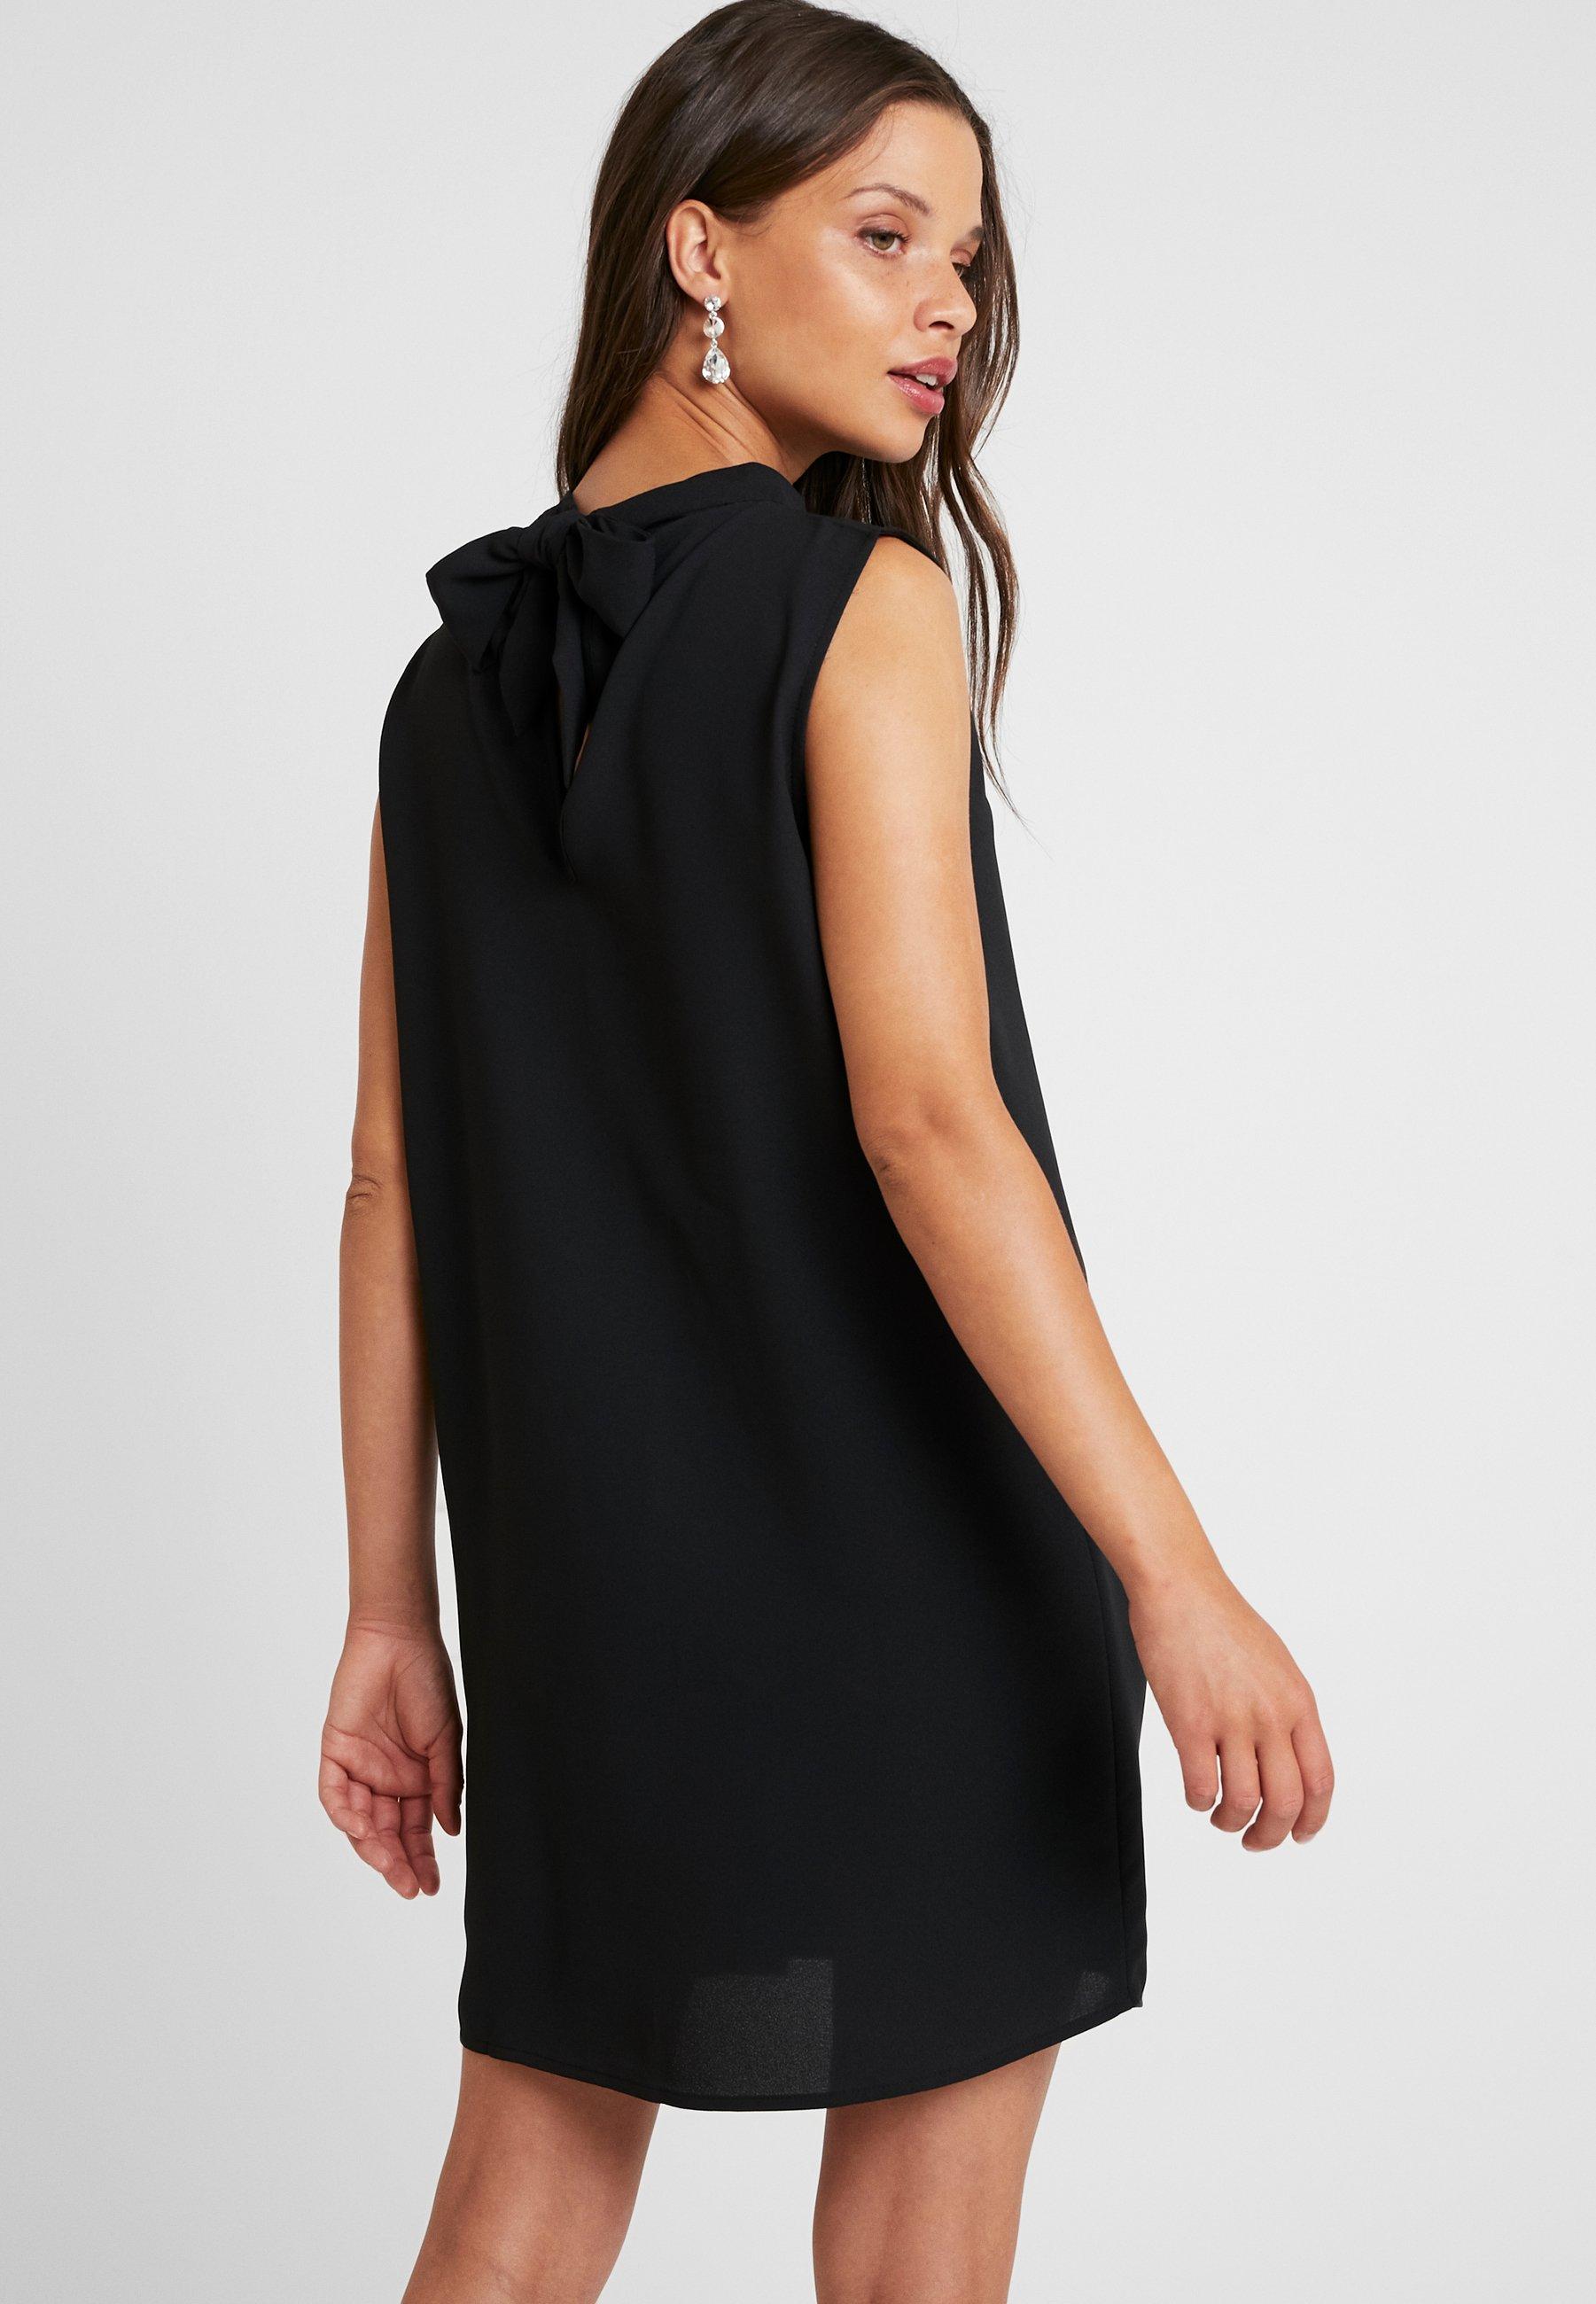 Black amp;odd D'étéJet Even Petite Robe TOlwXZuPik